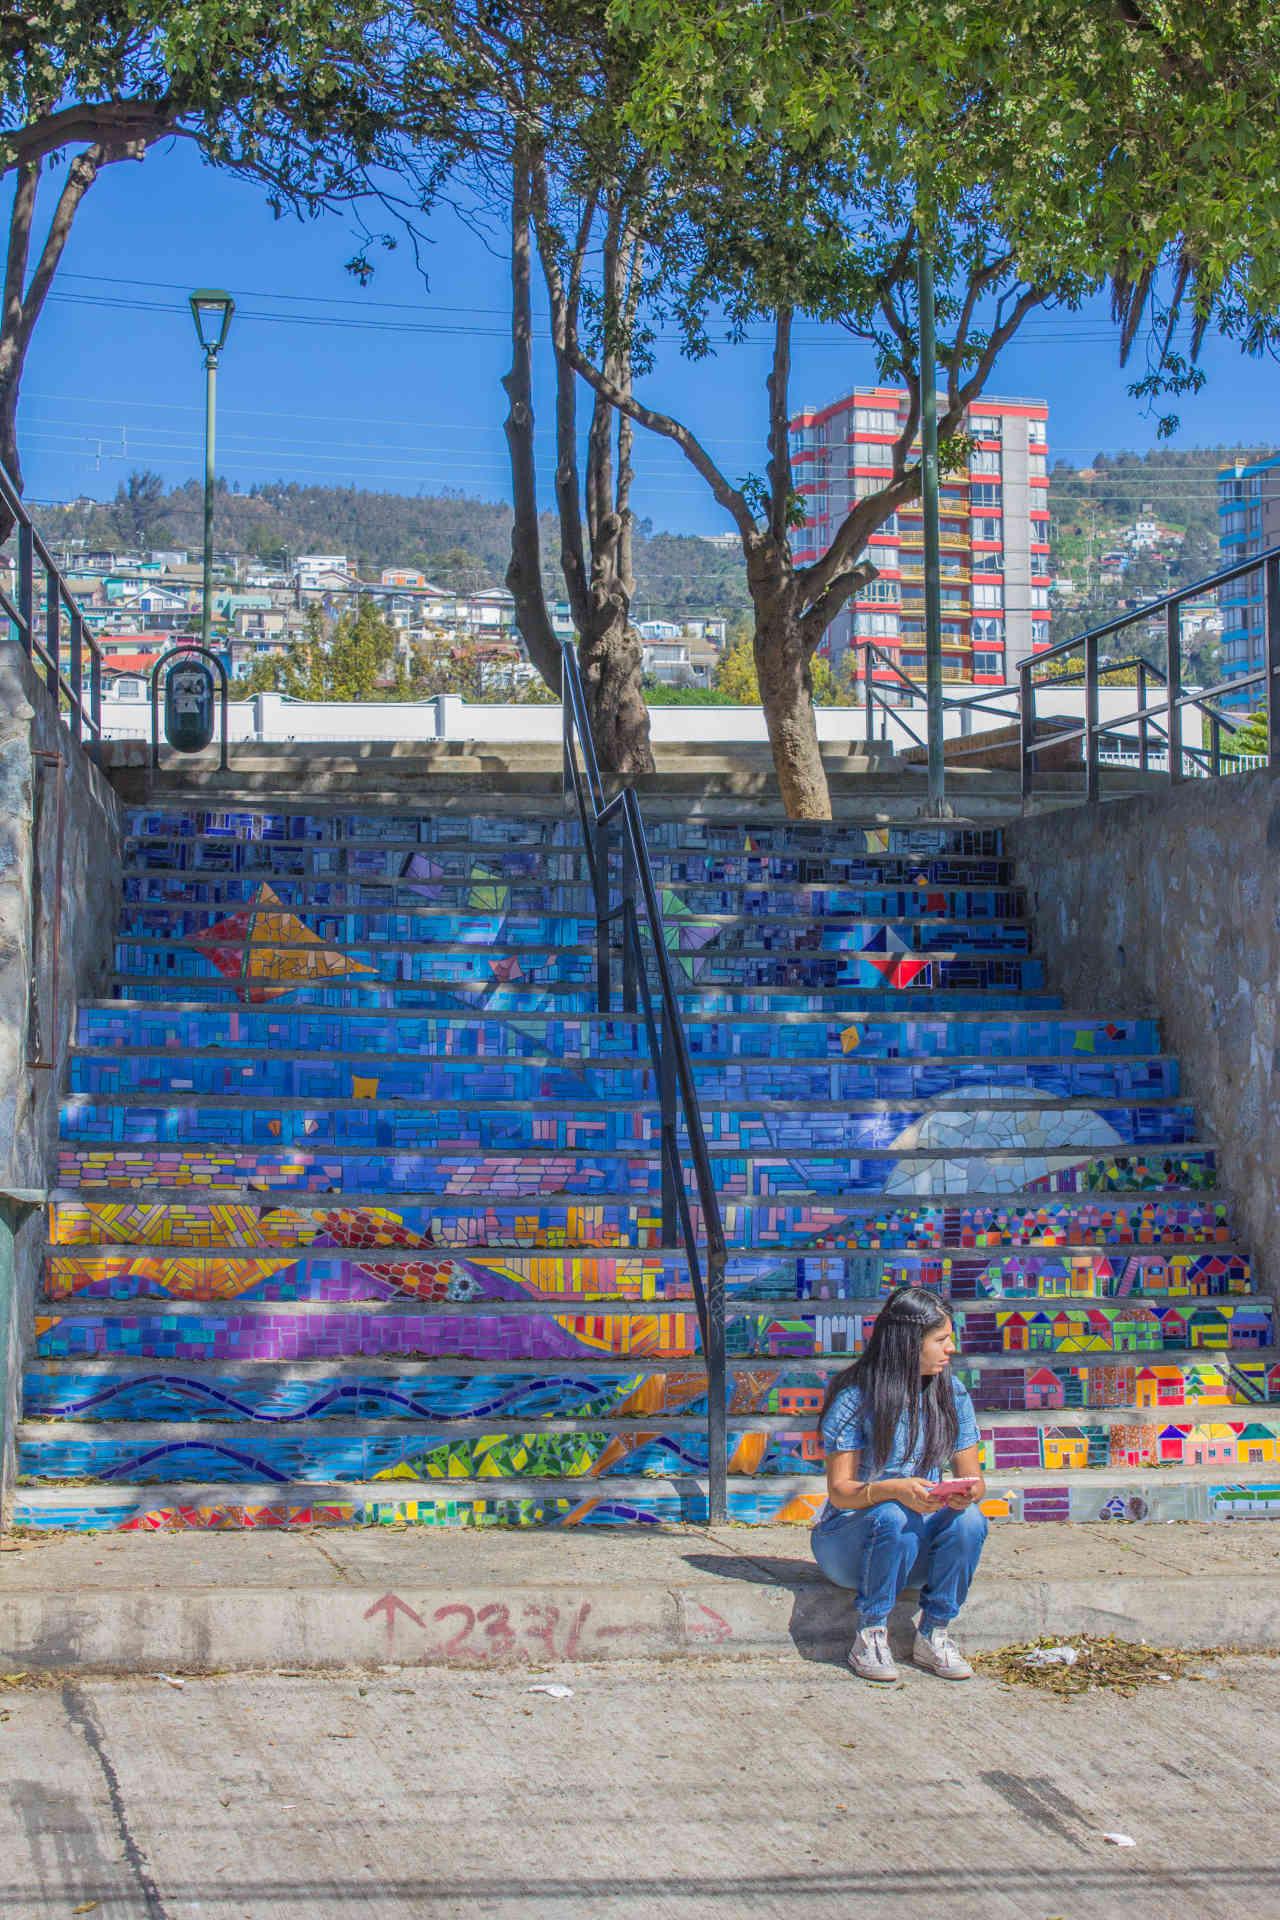 Escalera Plaza Mena